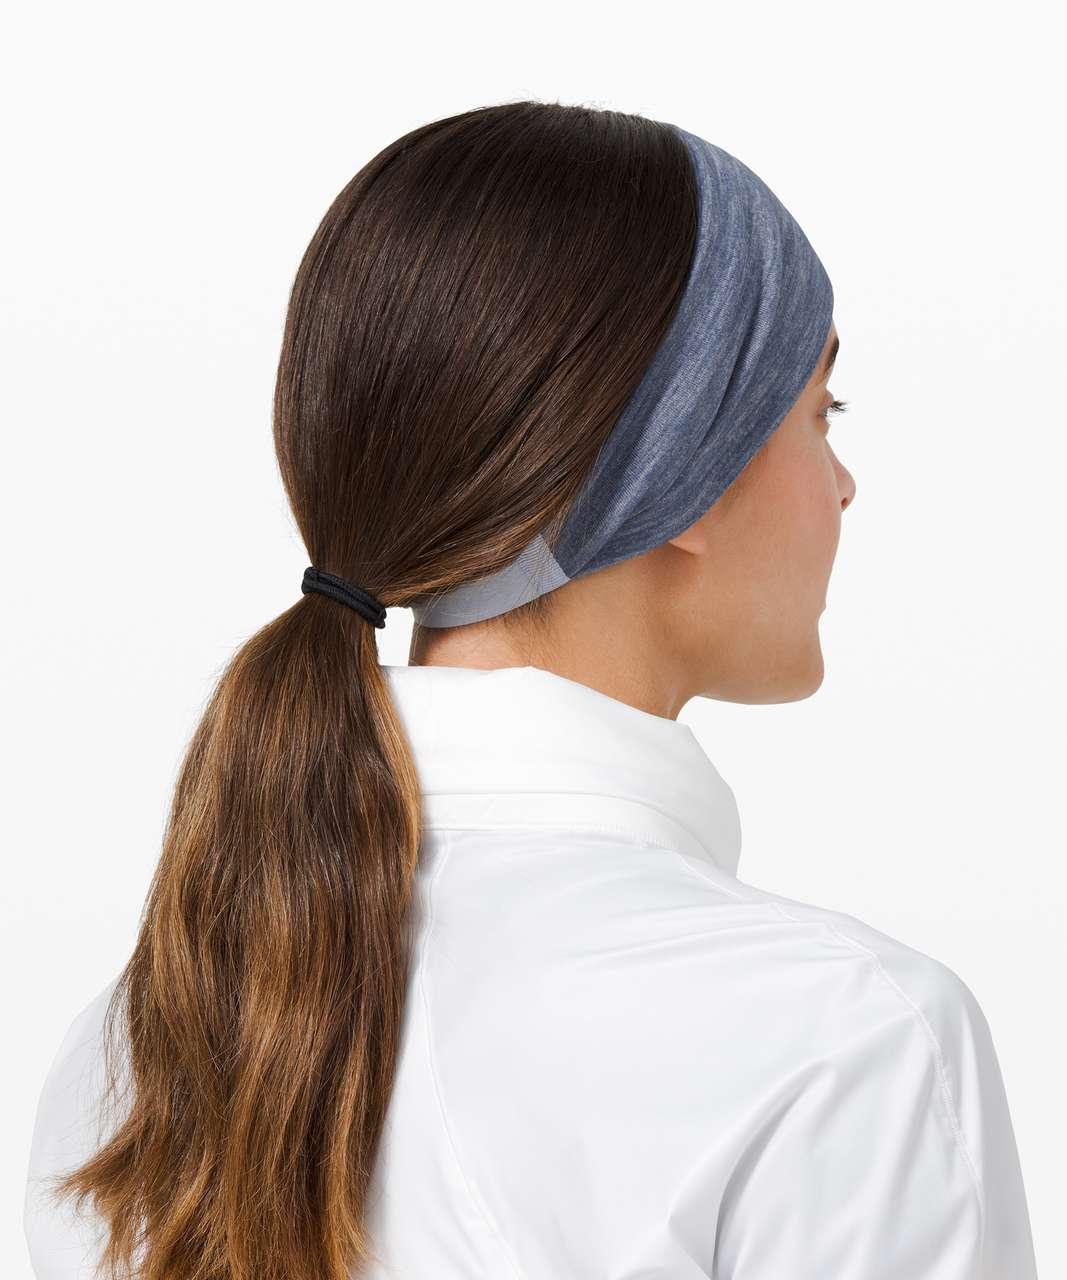 Lululemon Fringe Fighter Headband - Diamond Dye Daydream Ink Blue / Heathered Ink Blue